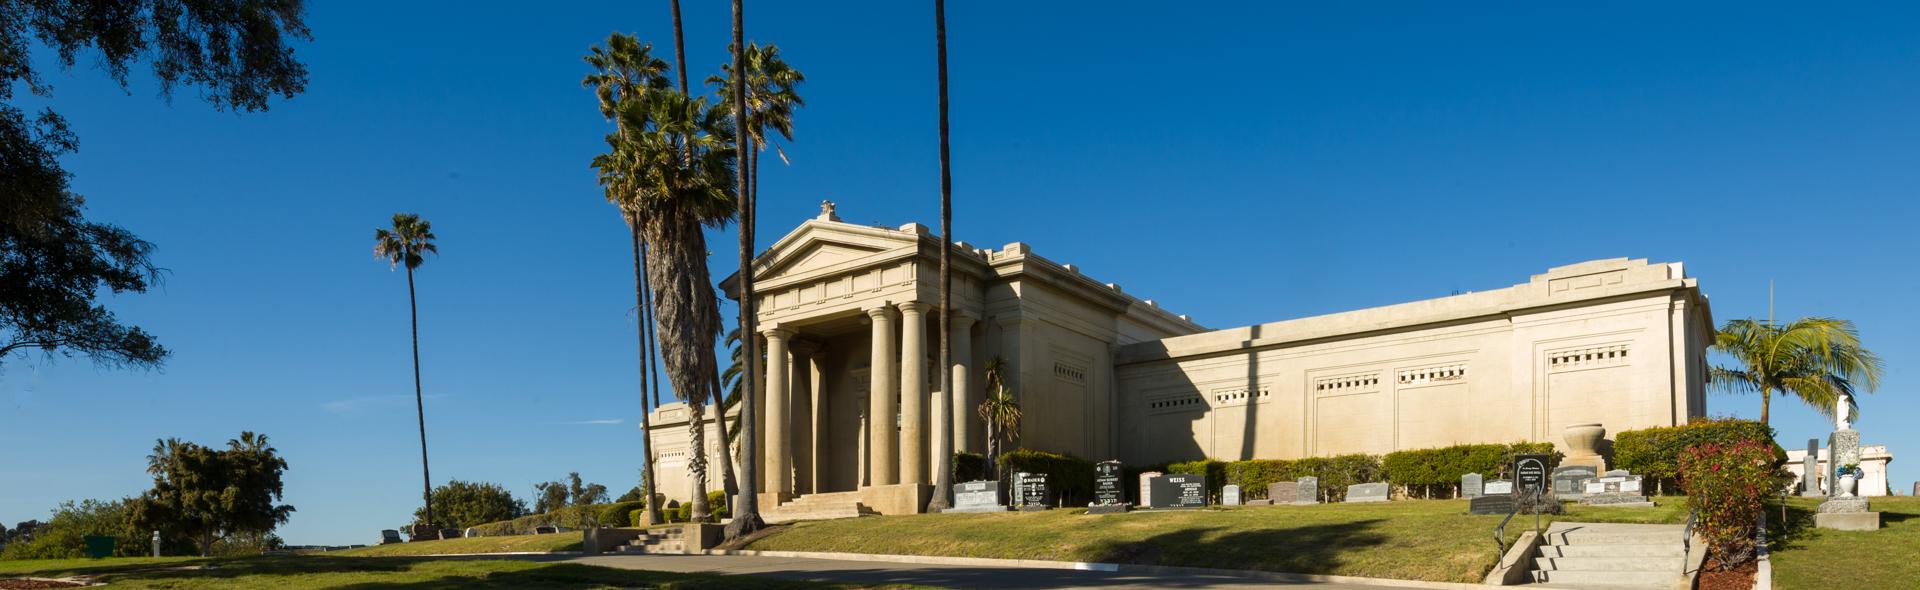 Greenwood Mortuary, Crematory and Memorial Park